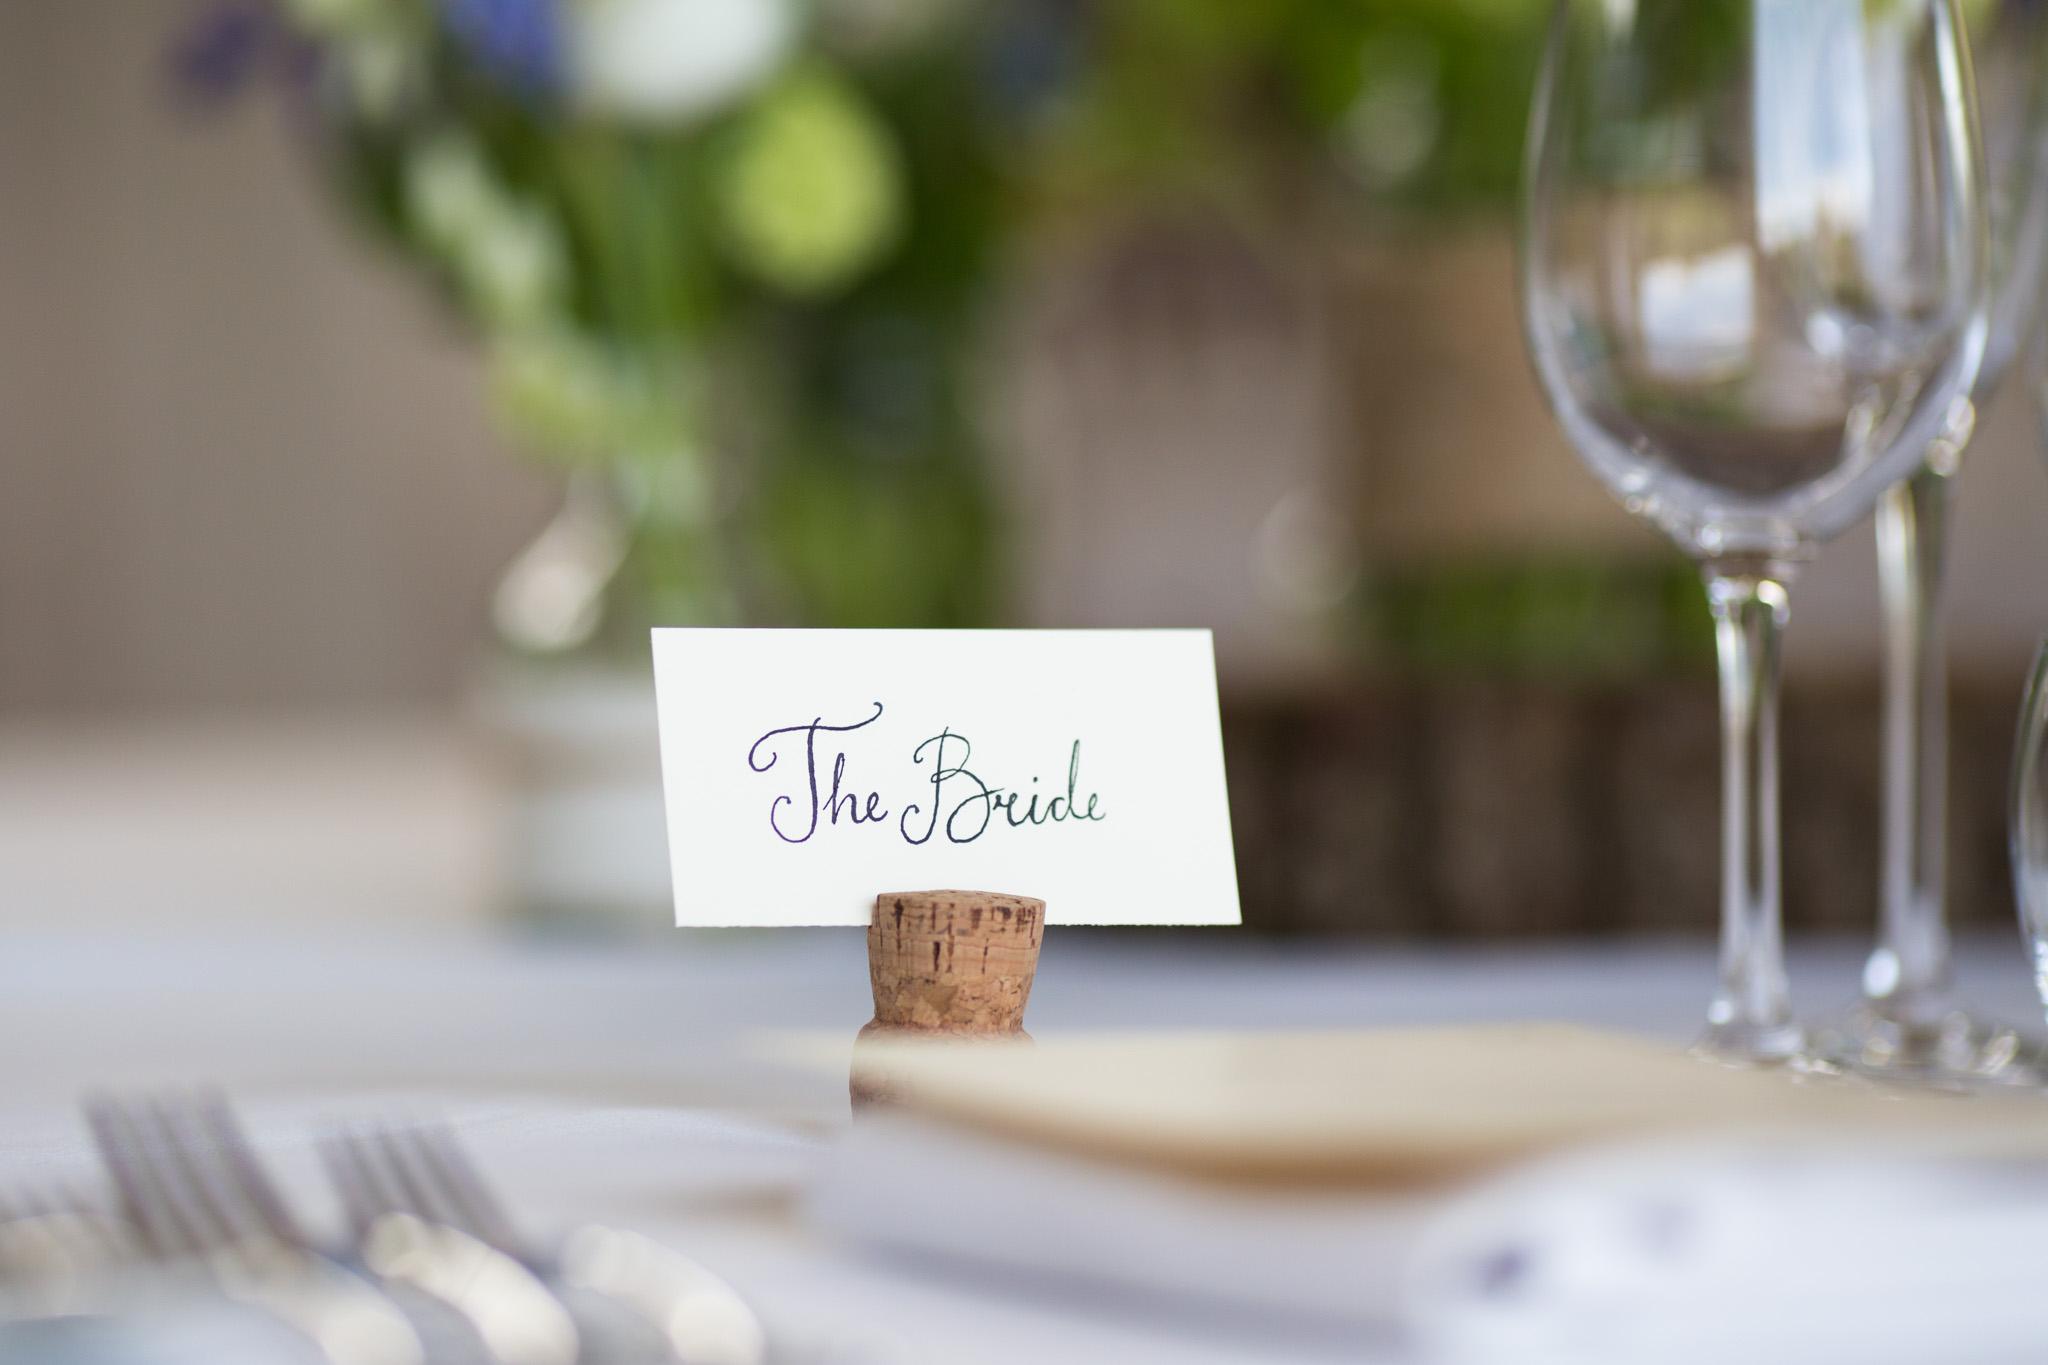 Mark_Barnes_Gloucester_Wedding_Photographer_Elmore_Court_Wedding_Photography_Mike+Kelly-67.jpg